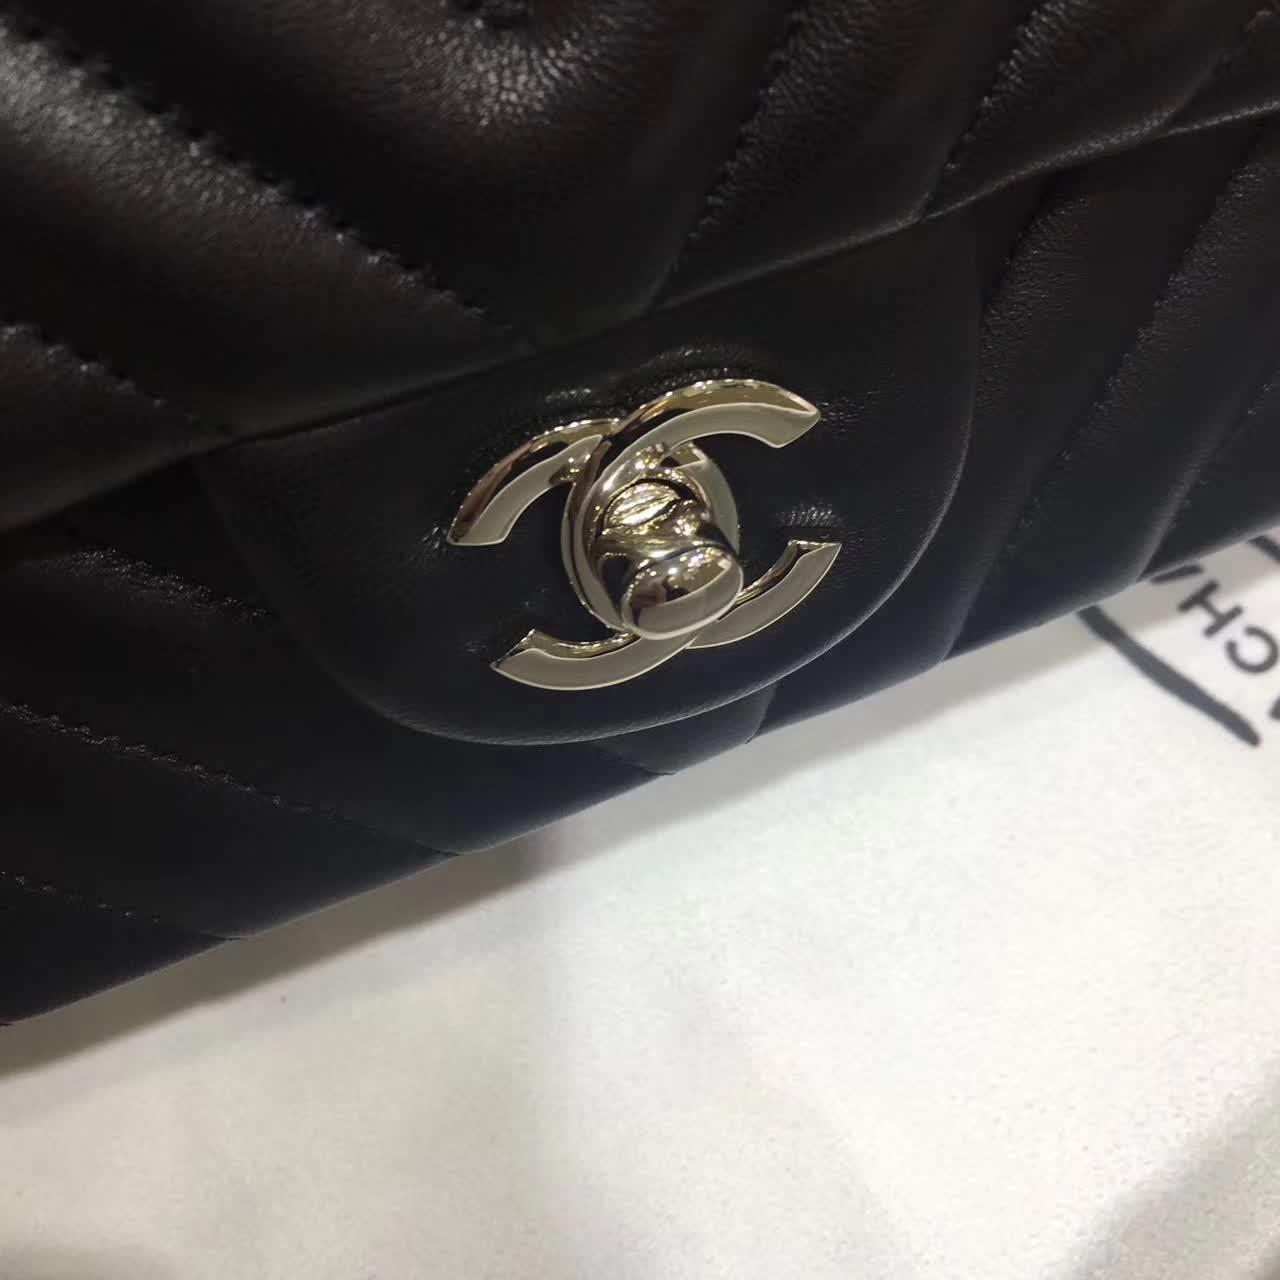 Chanel 香奈儿 V字绣 羊皮 黑色 25cm 五金:银色